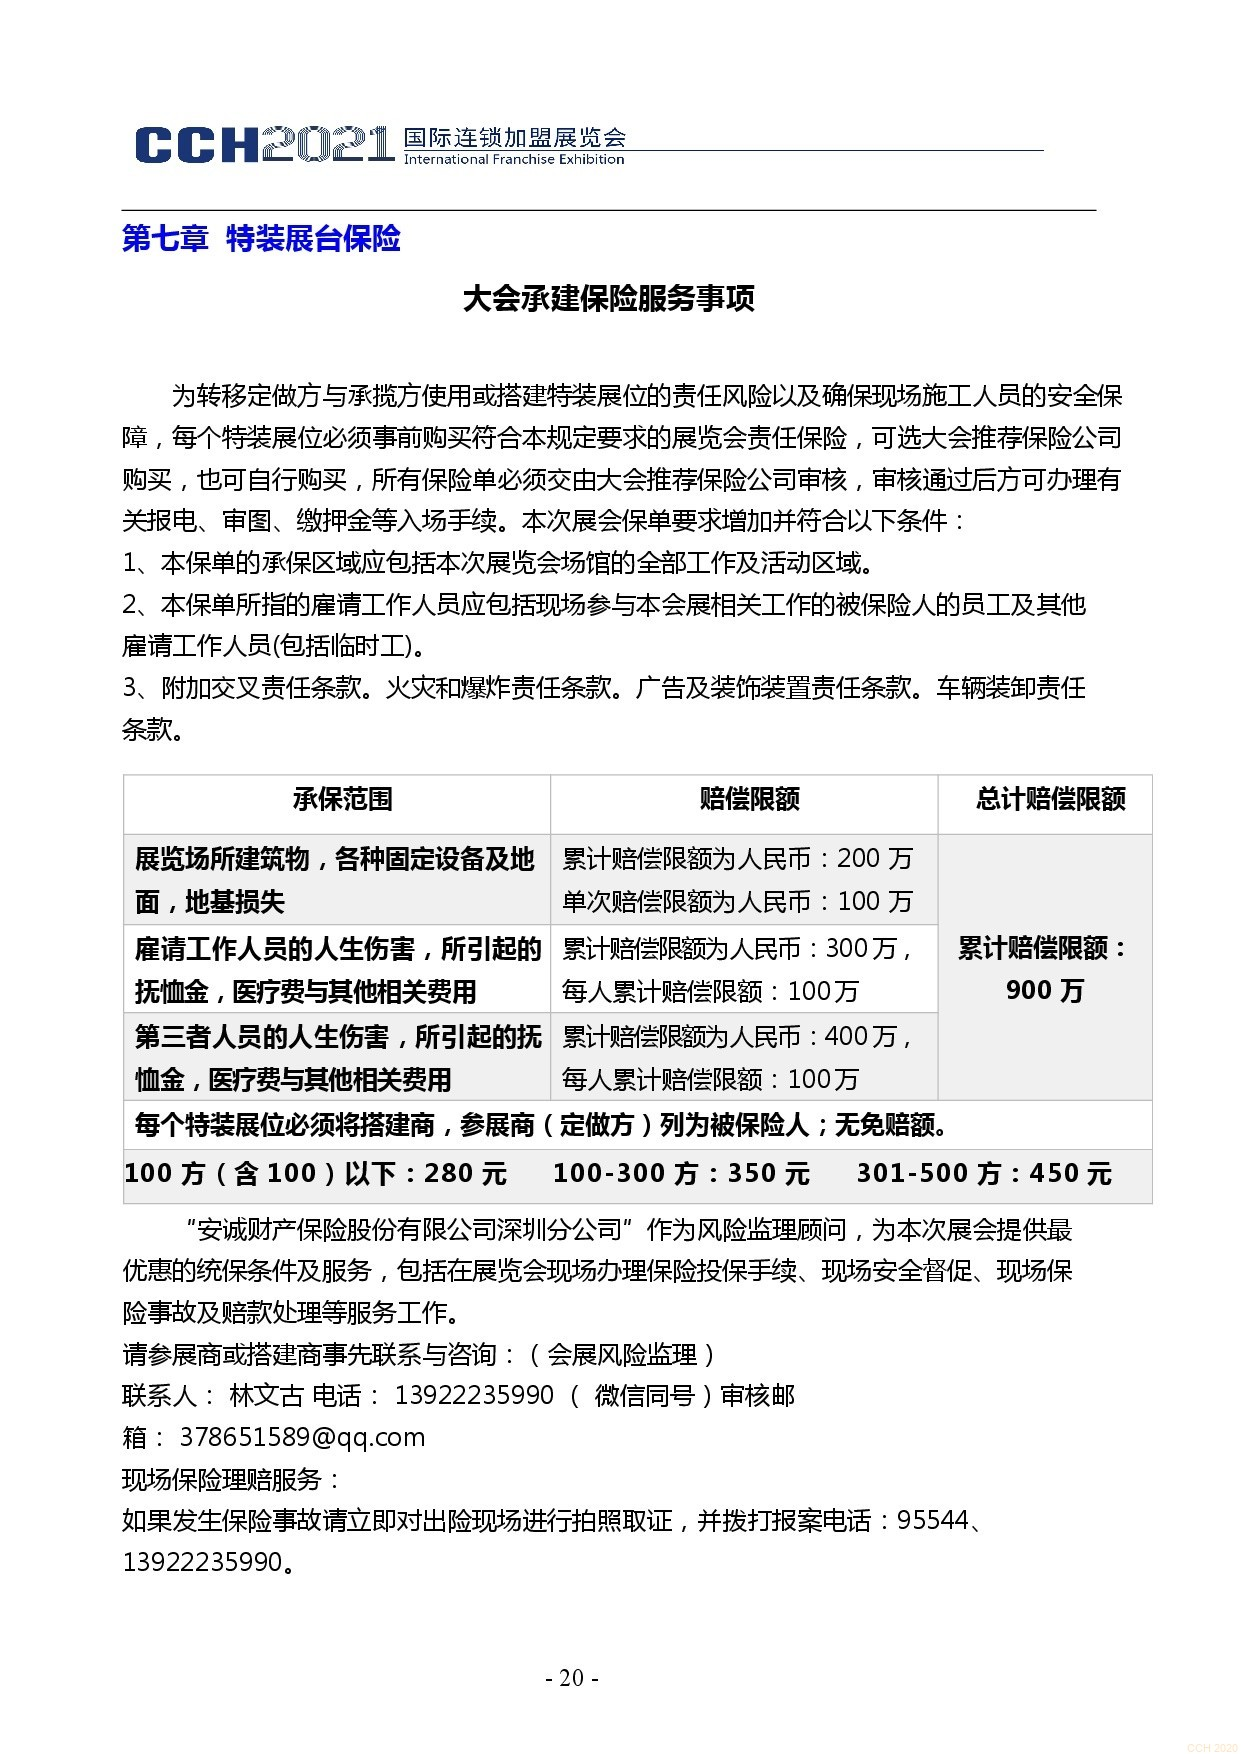 0416CCH深圳展参展商手册4.16-020.jpg